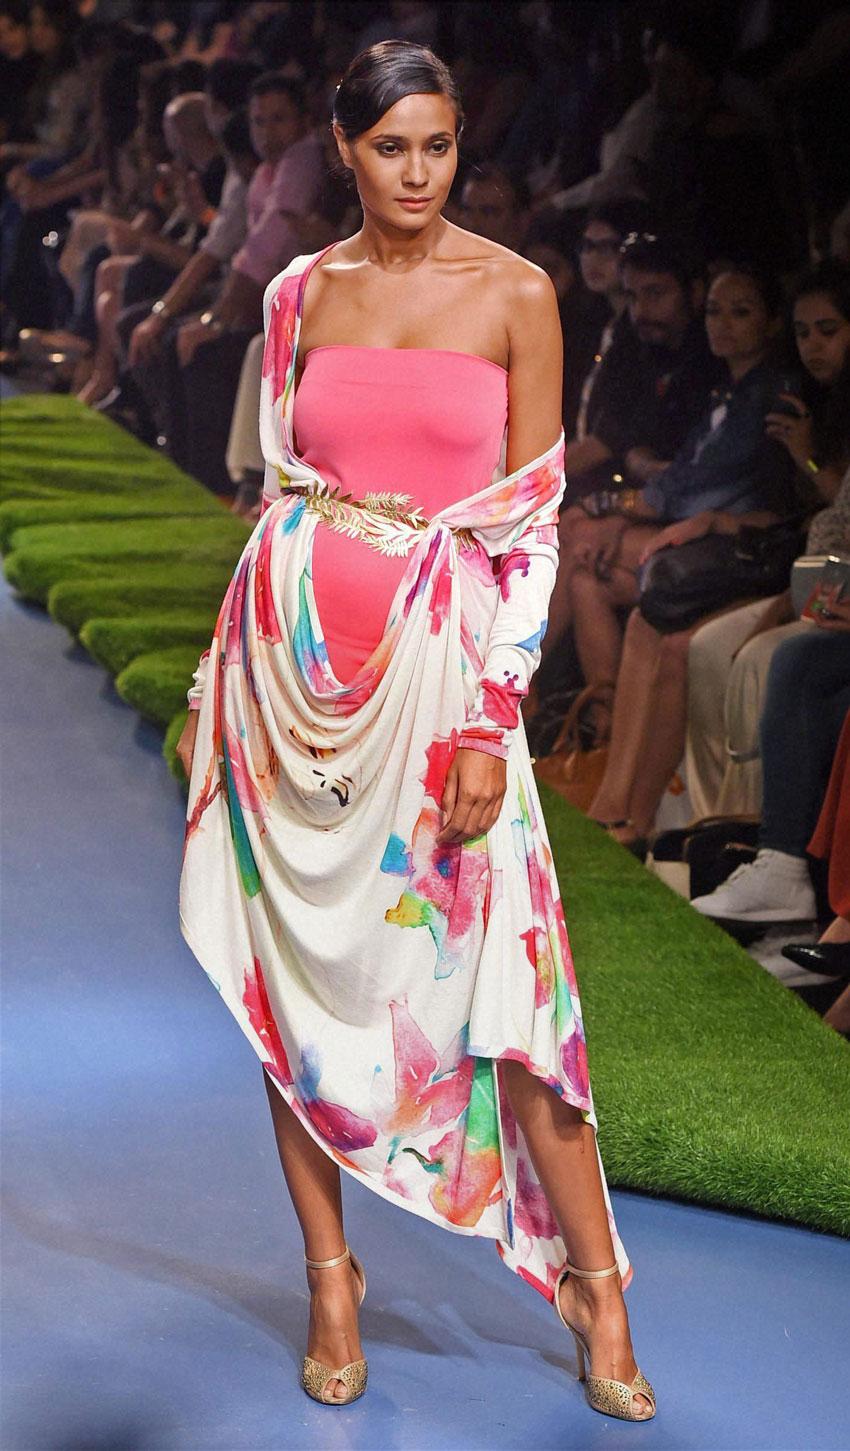 A model walks the ramp during the Lakme´ Fashion Week Summer Resort 2015 in Mumbai. (Shashank Parade   PTI)